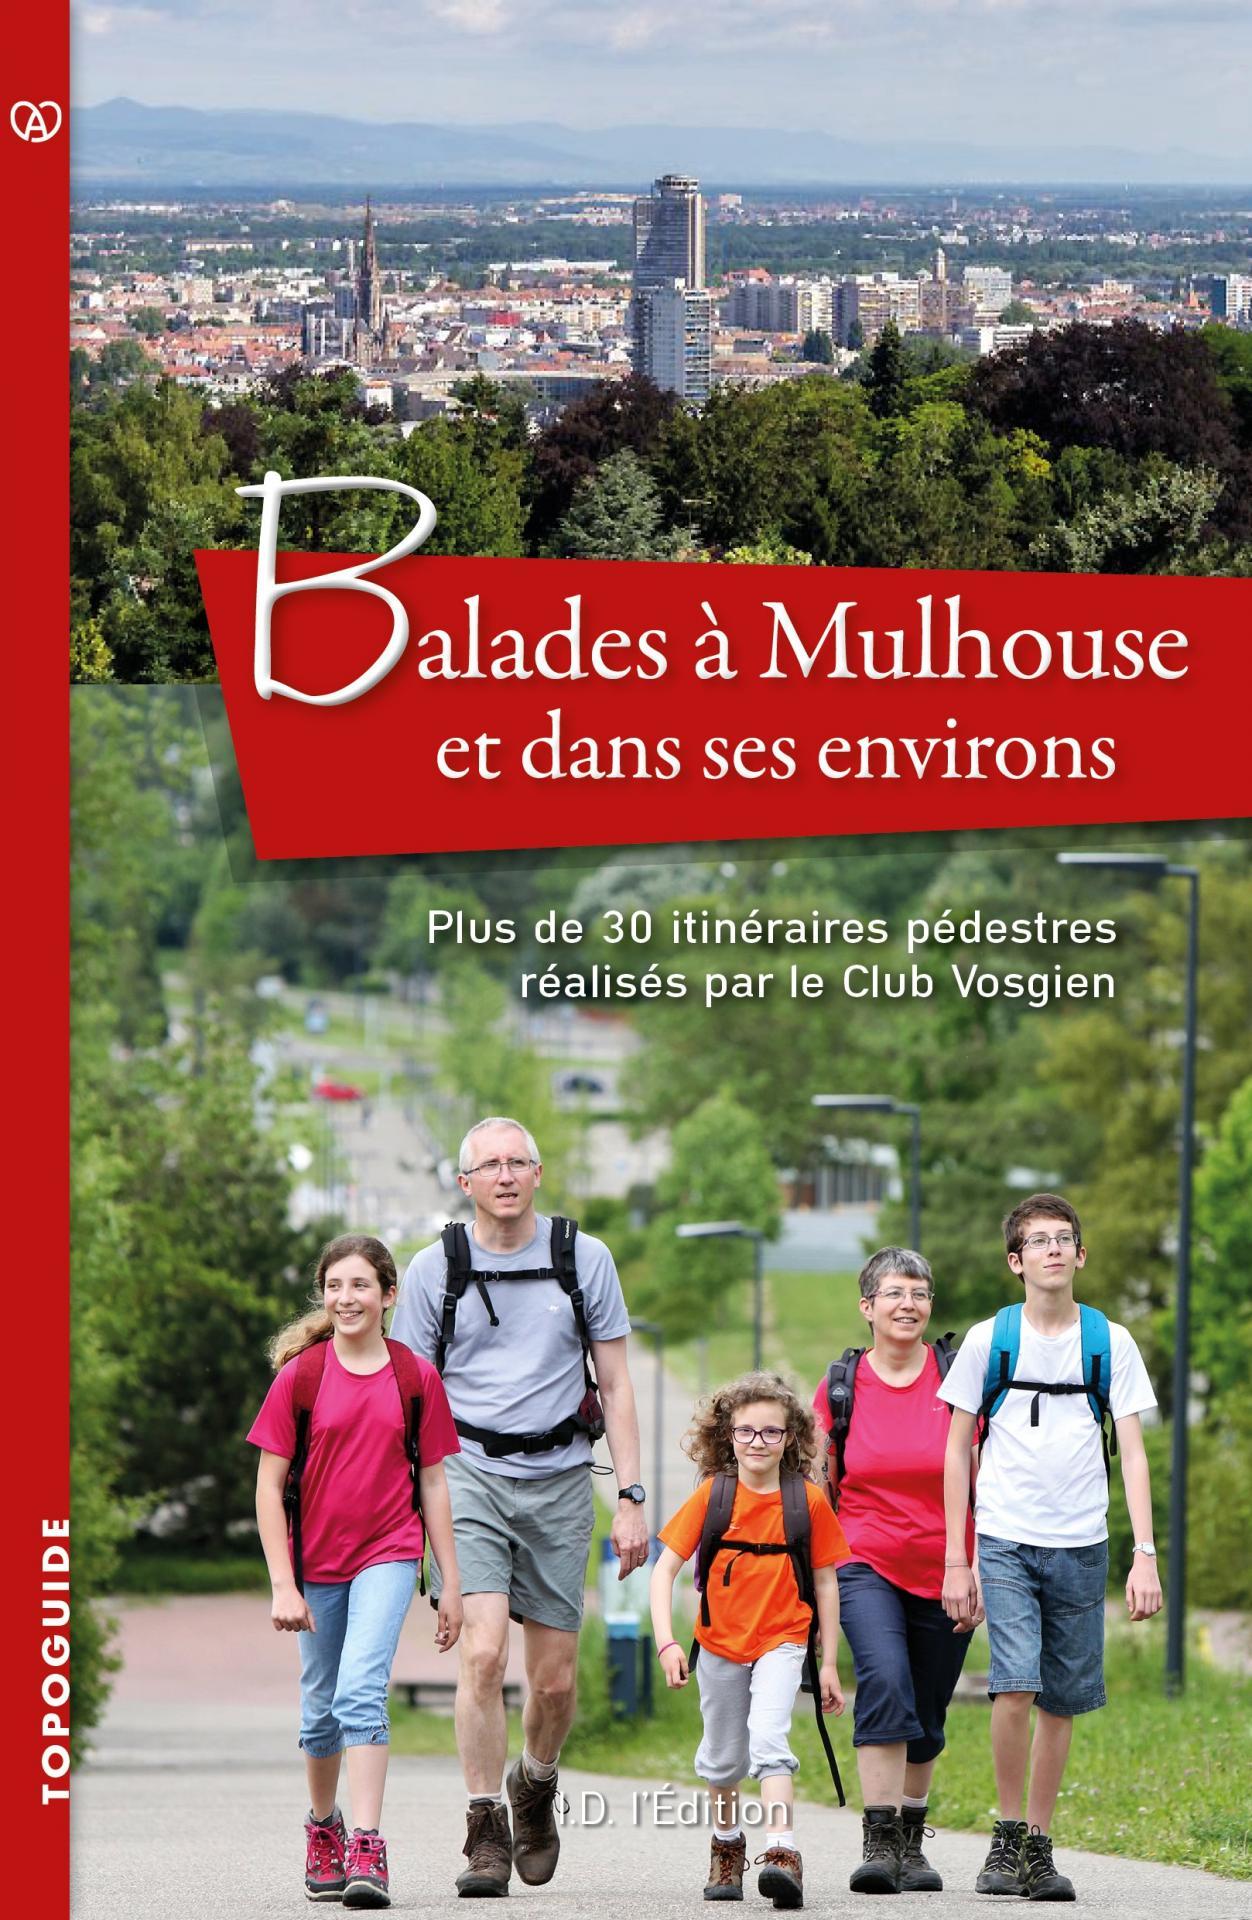 Balade a mulhouse